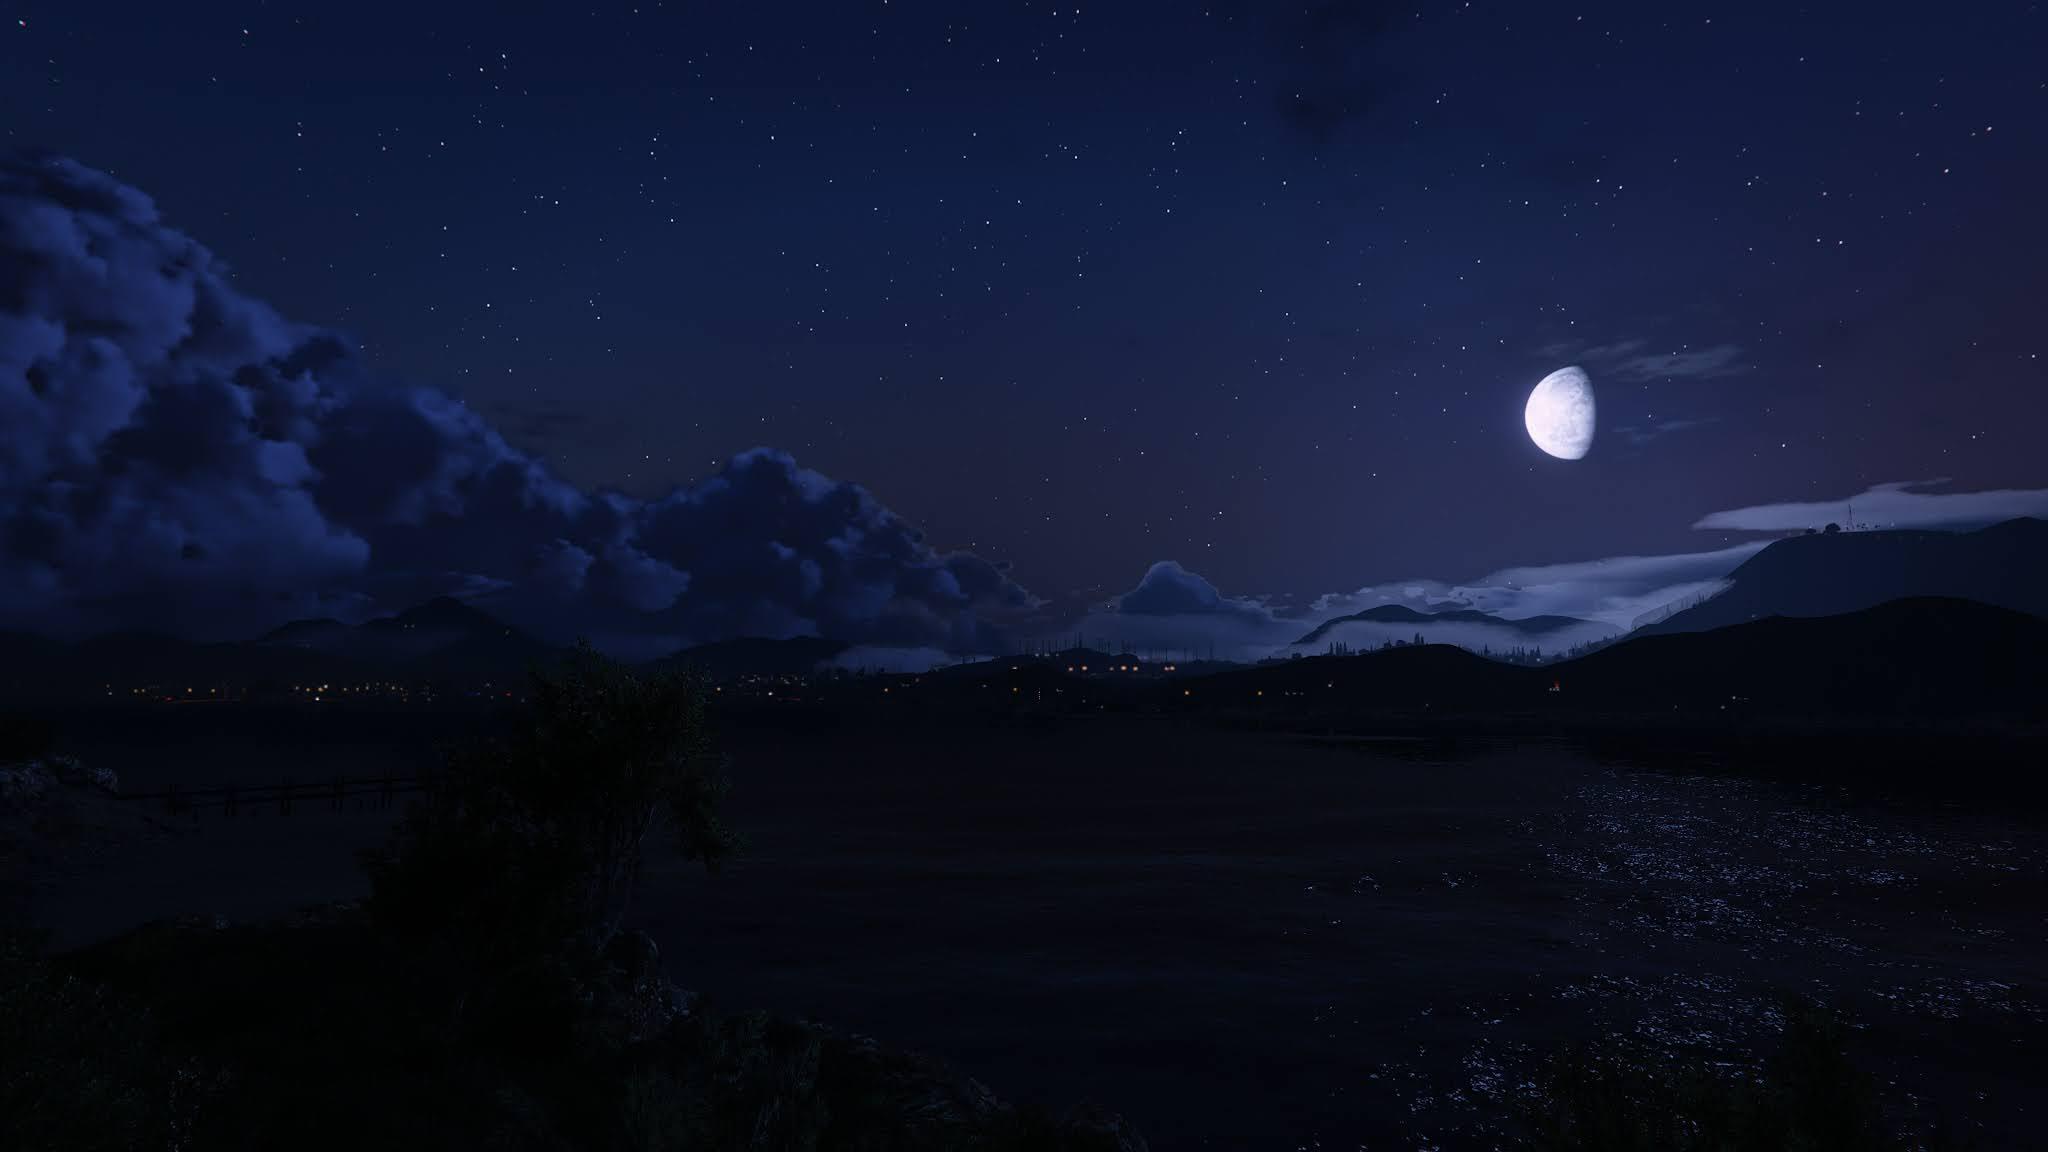 Landscapes Ultra HD 4K wallpapers